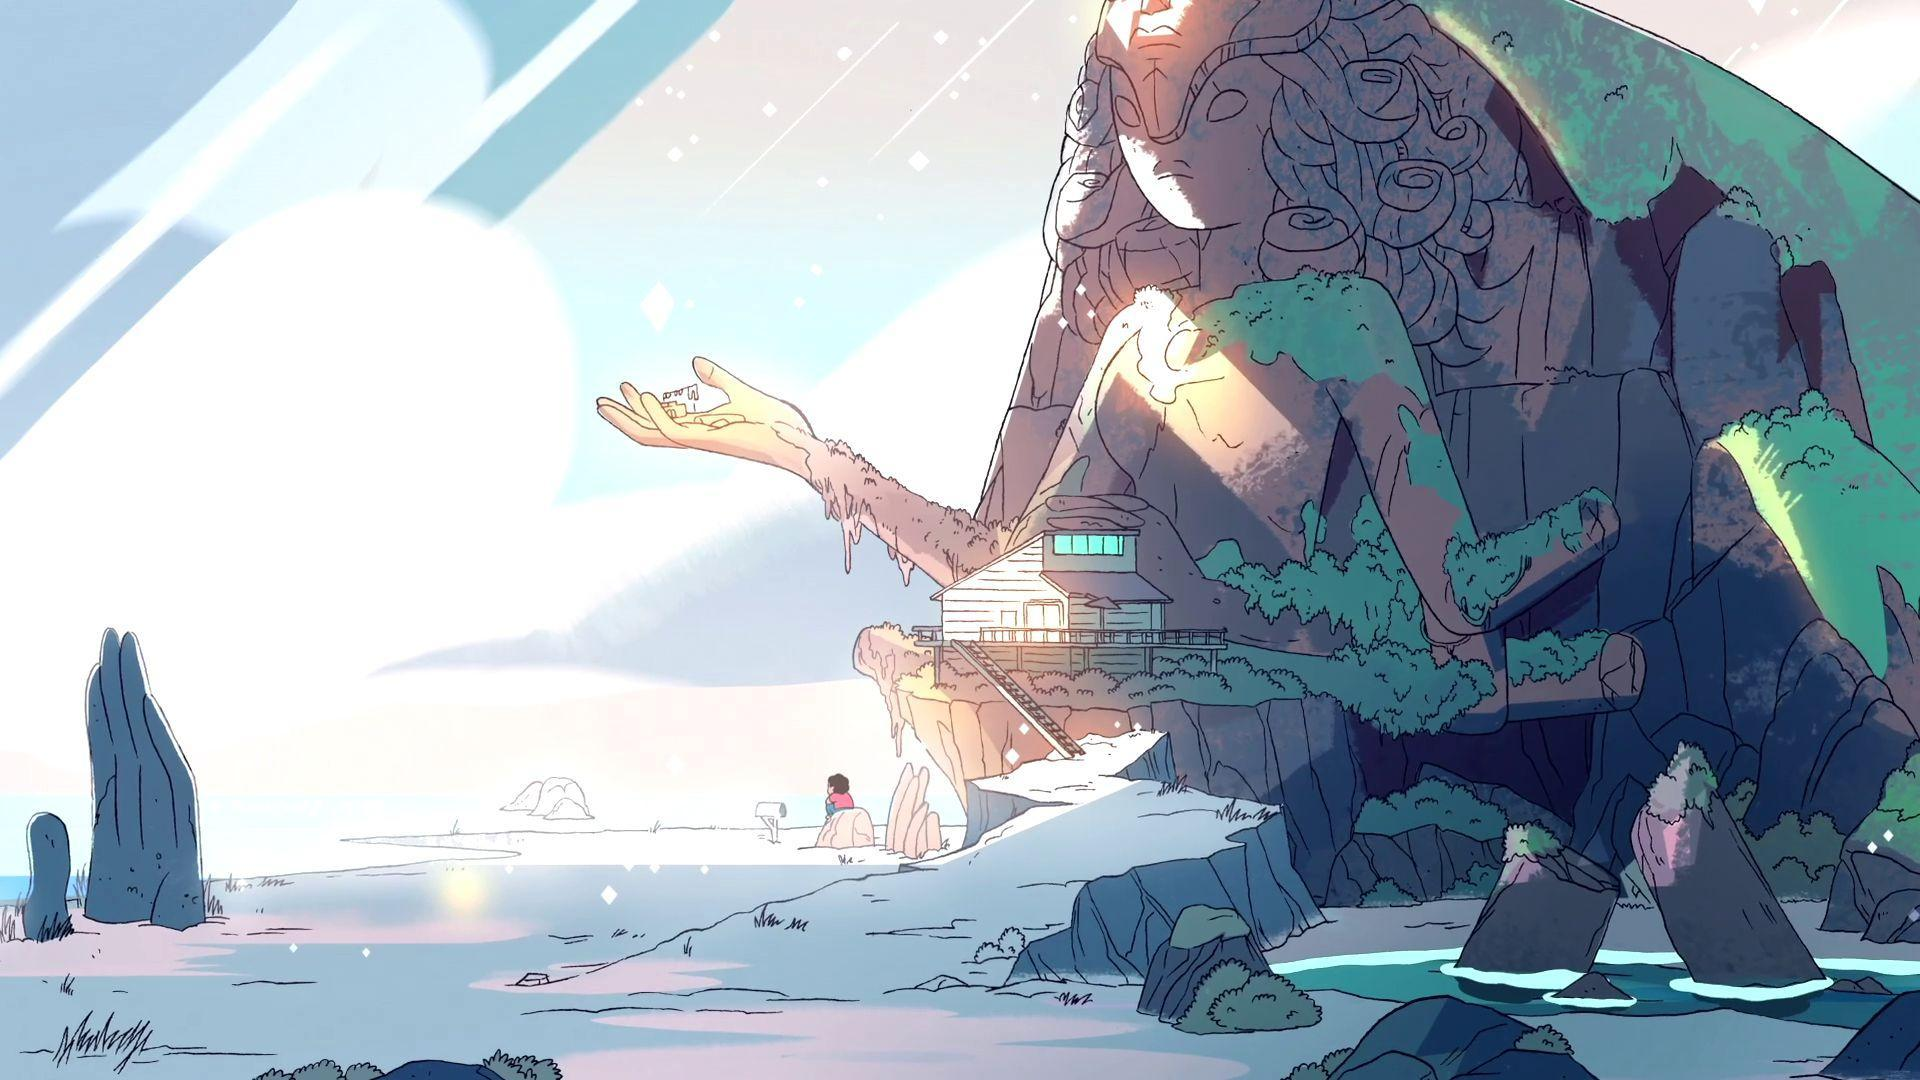 Steven Universe Wallpapers - Wallpaper Cave